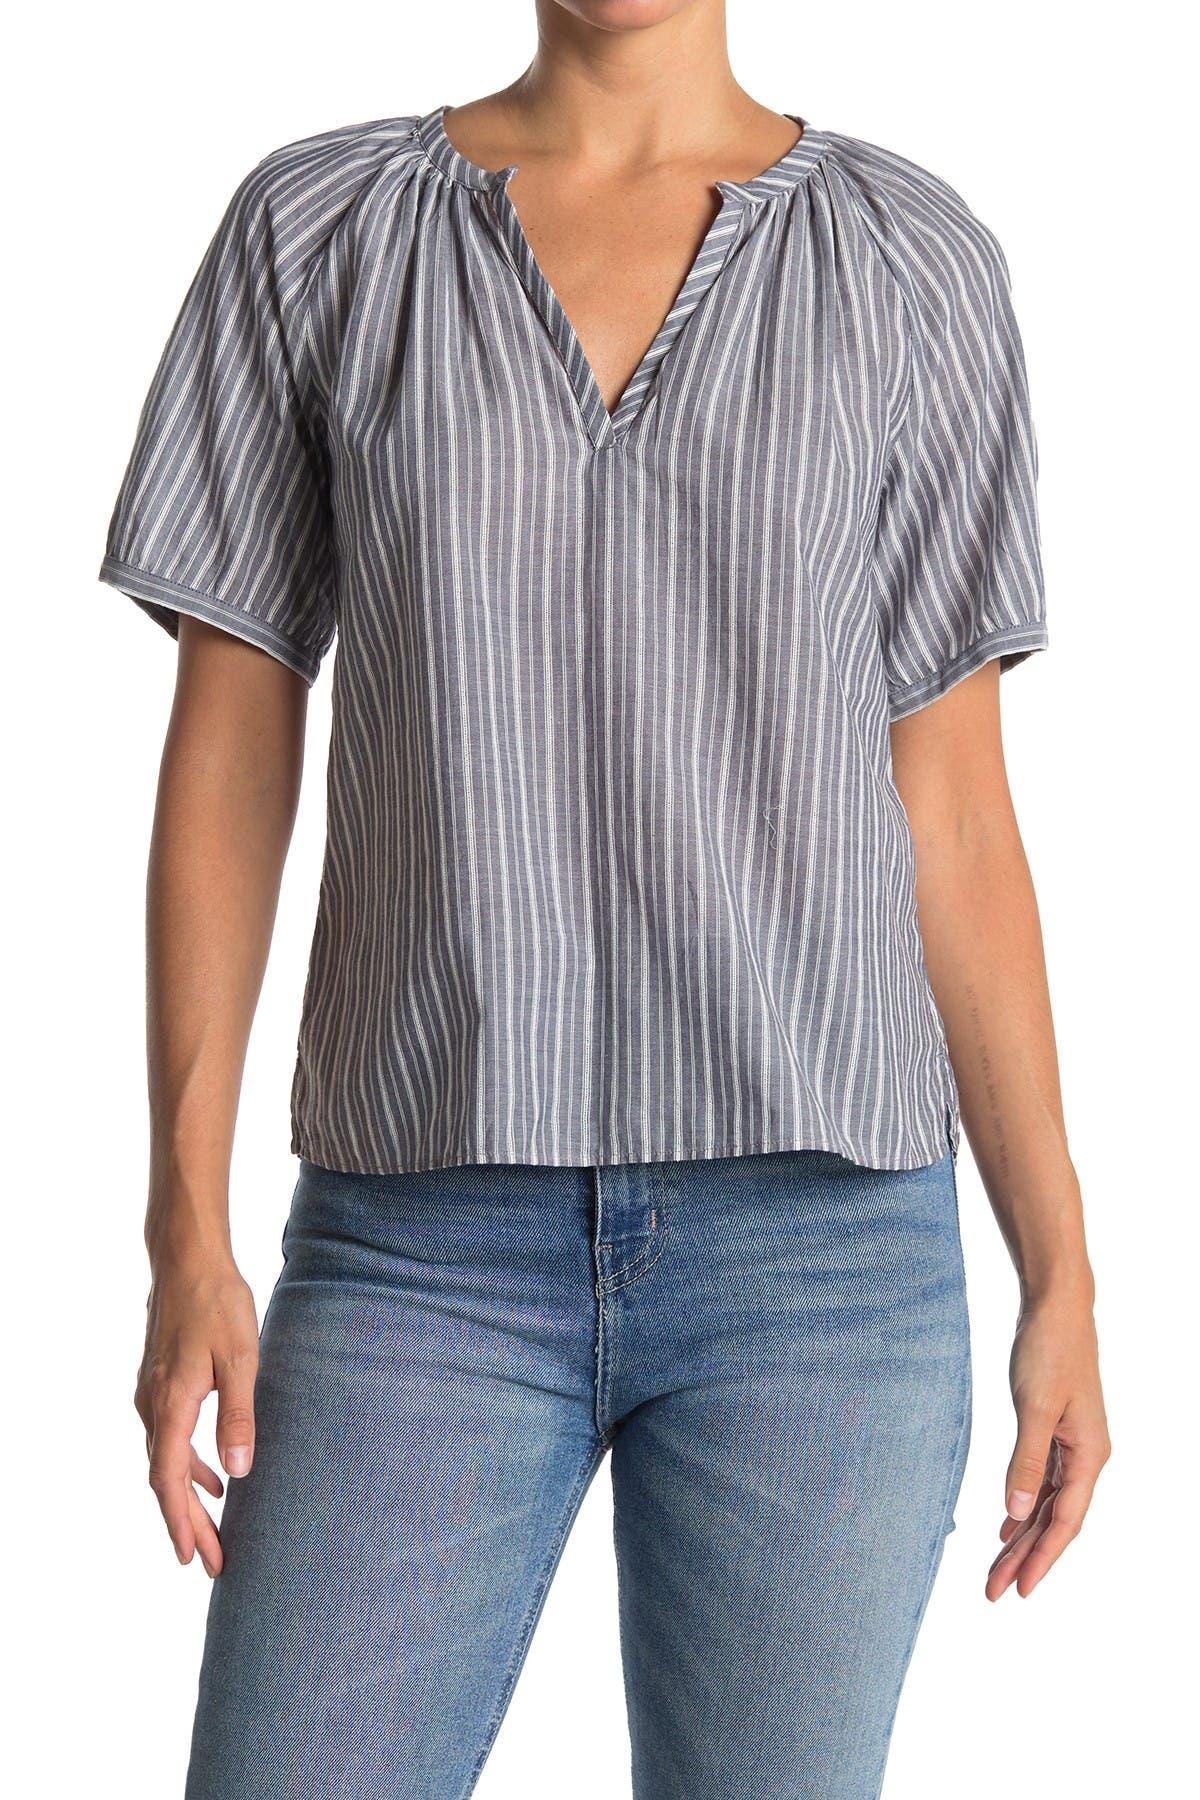 Image of Caslon Textured Stripe Split Neck Top